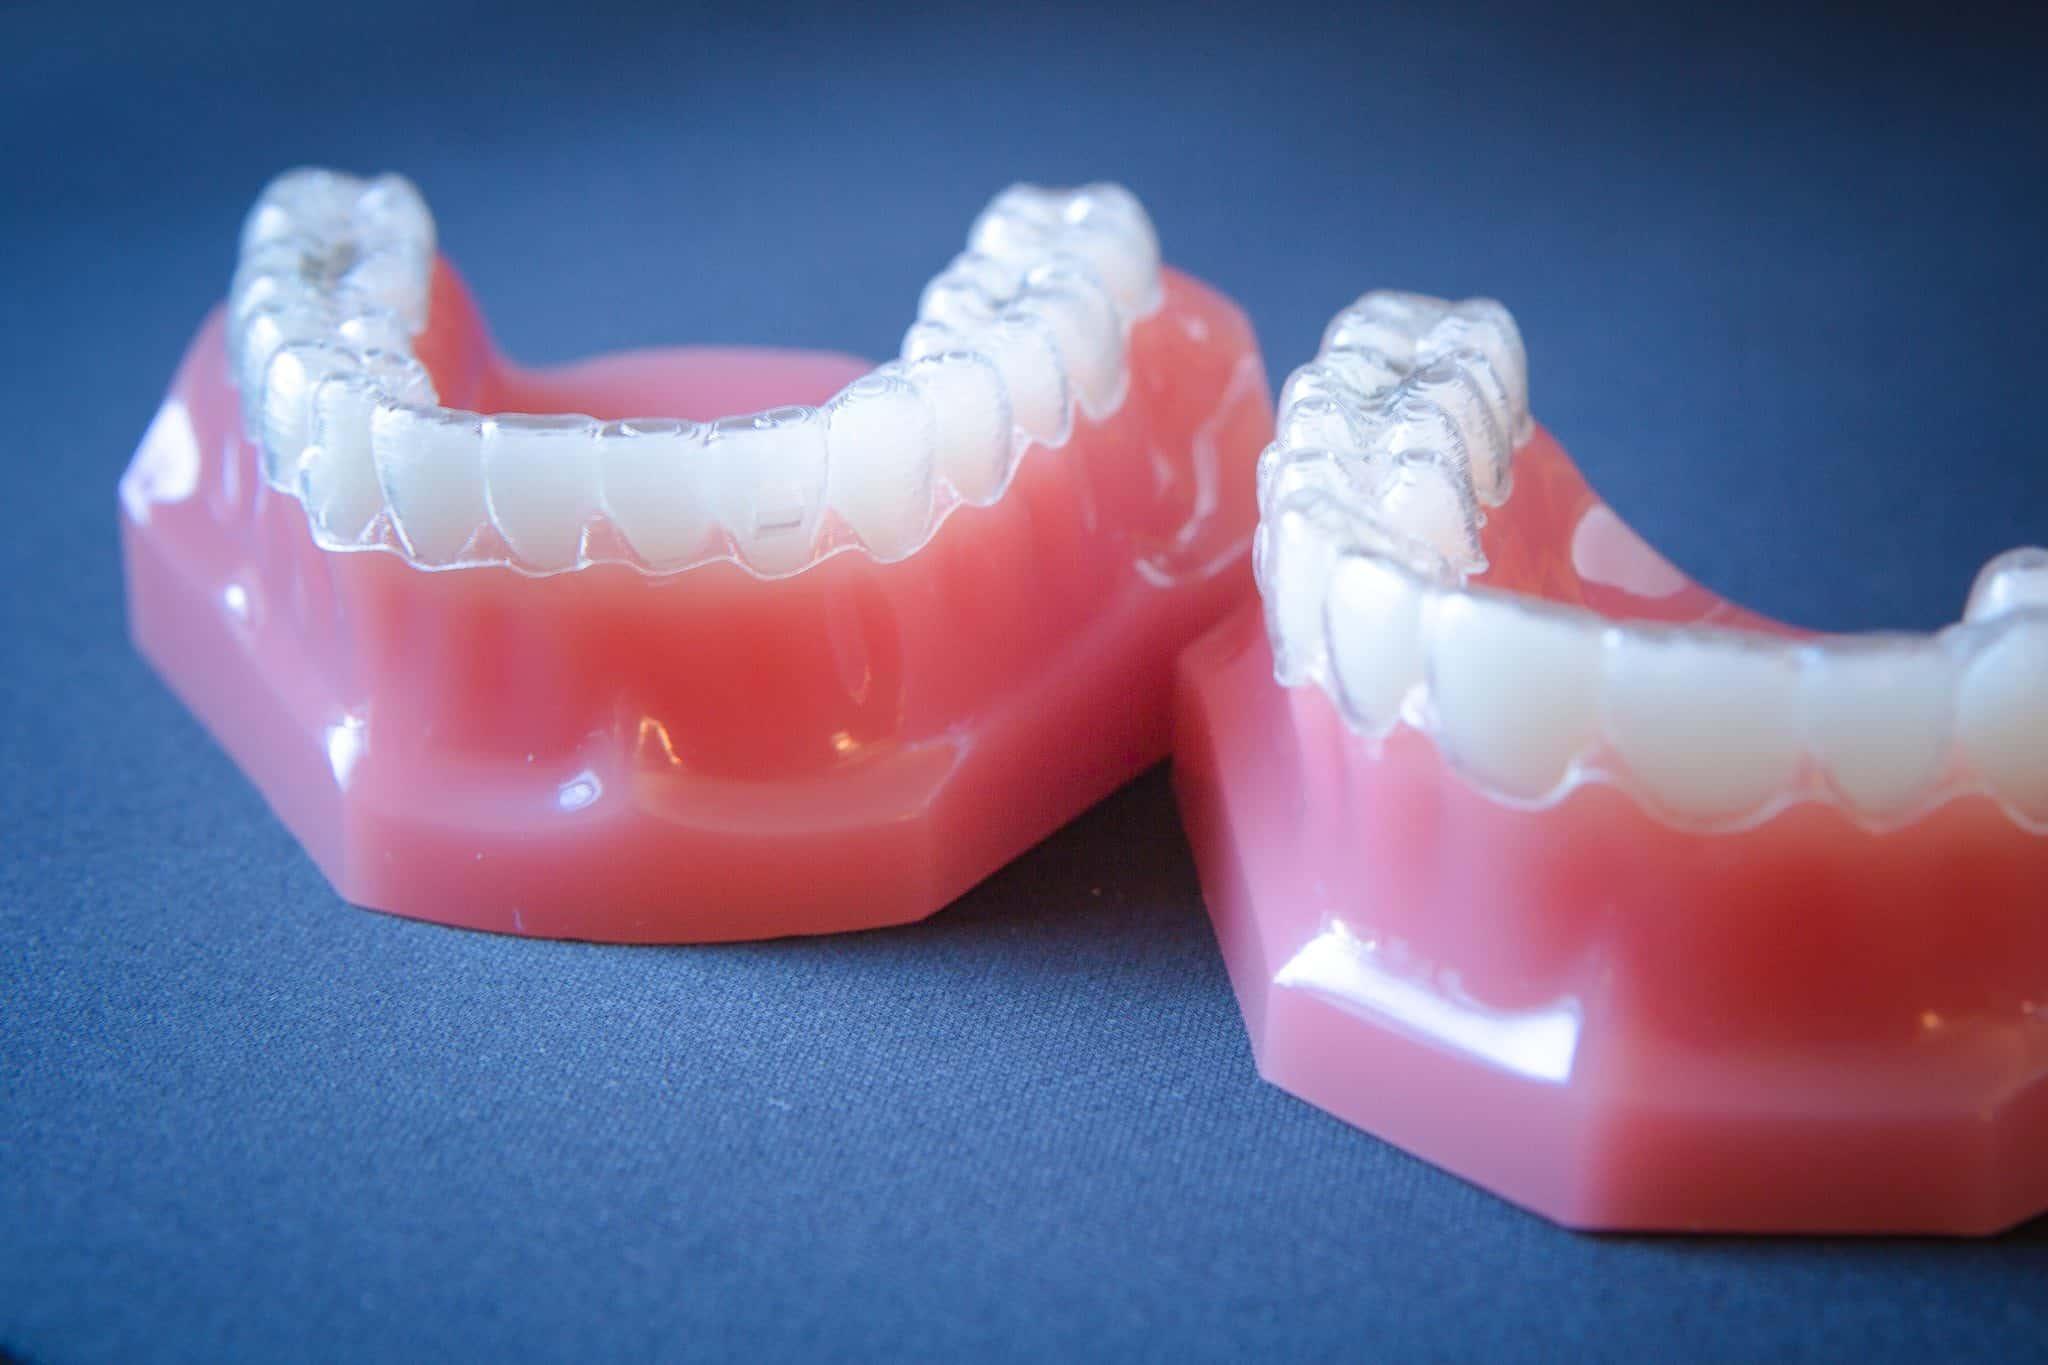 Appel Orthodontics Philadelphia Orthodontics Invisalign 2 of 7 2048x1365 - Invisalign and Invisalign Teen Top 1% Provider